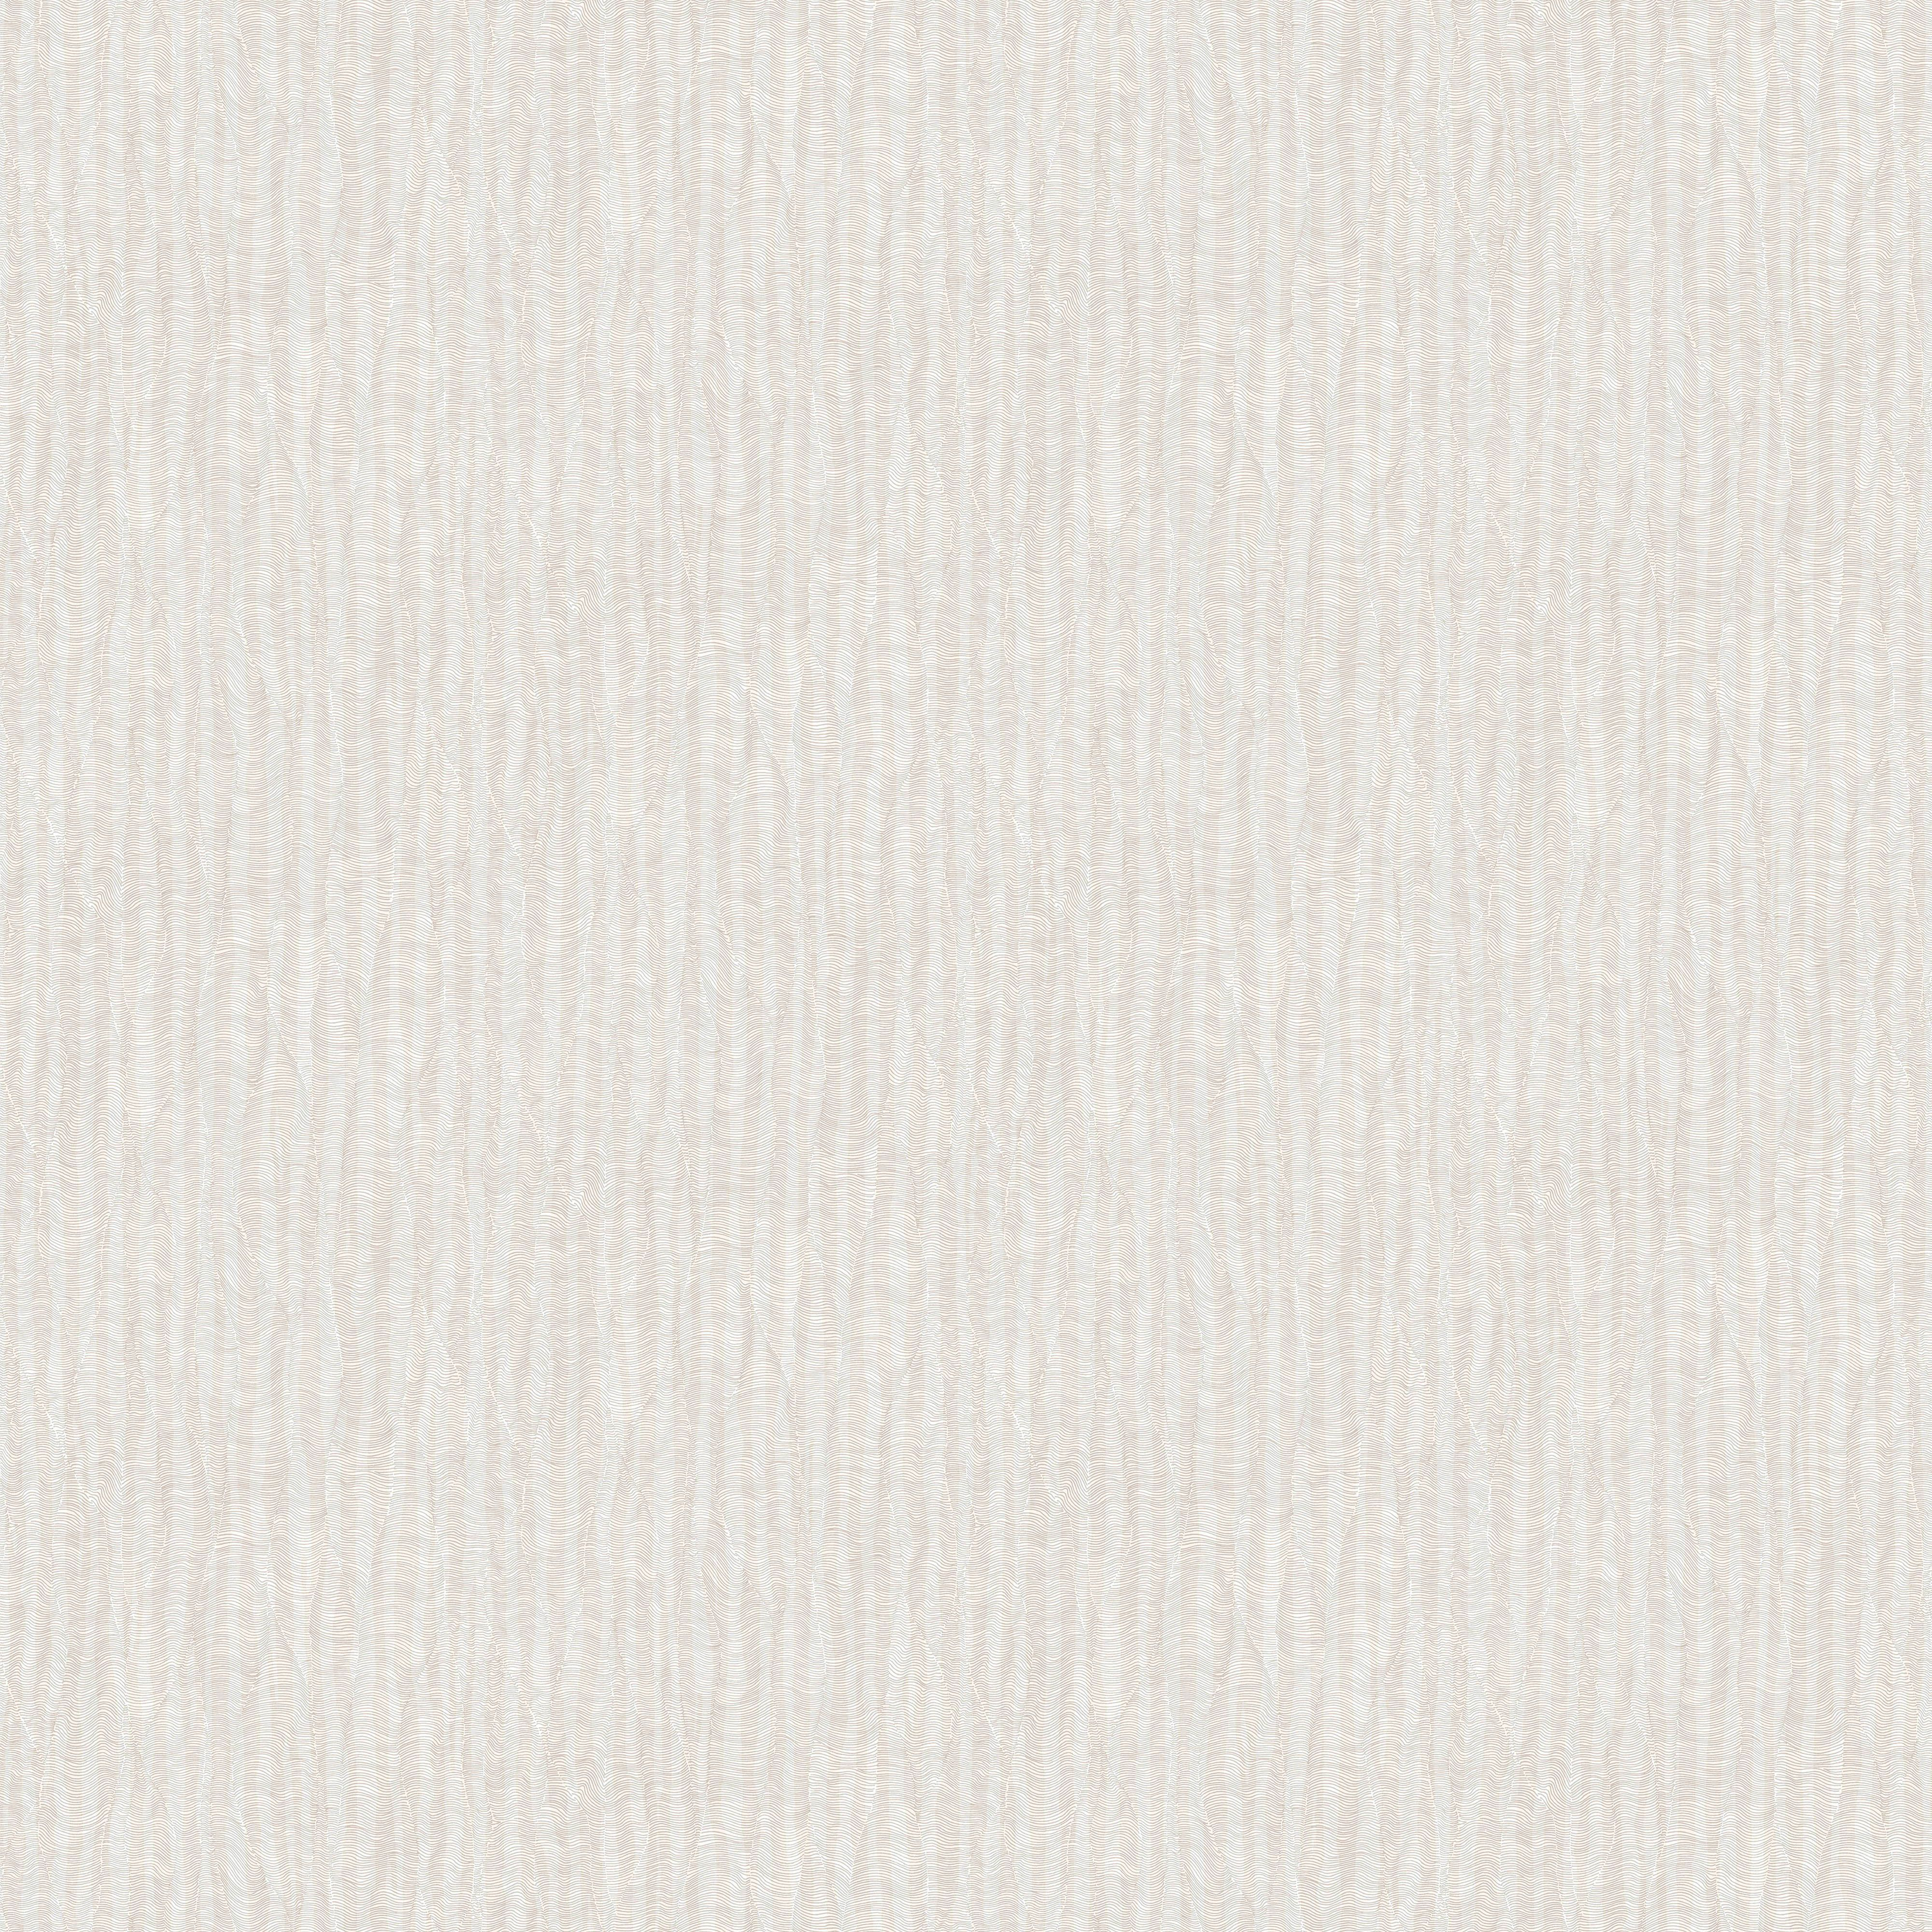 Diy at b q for Textured wallpaper